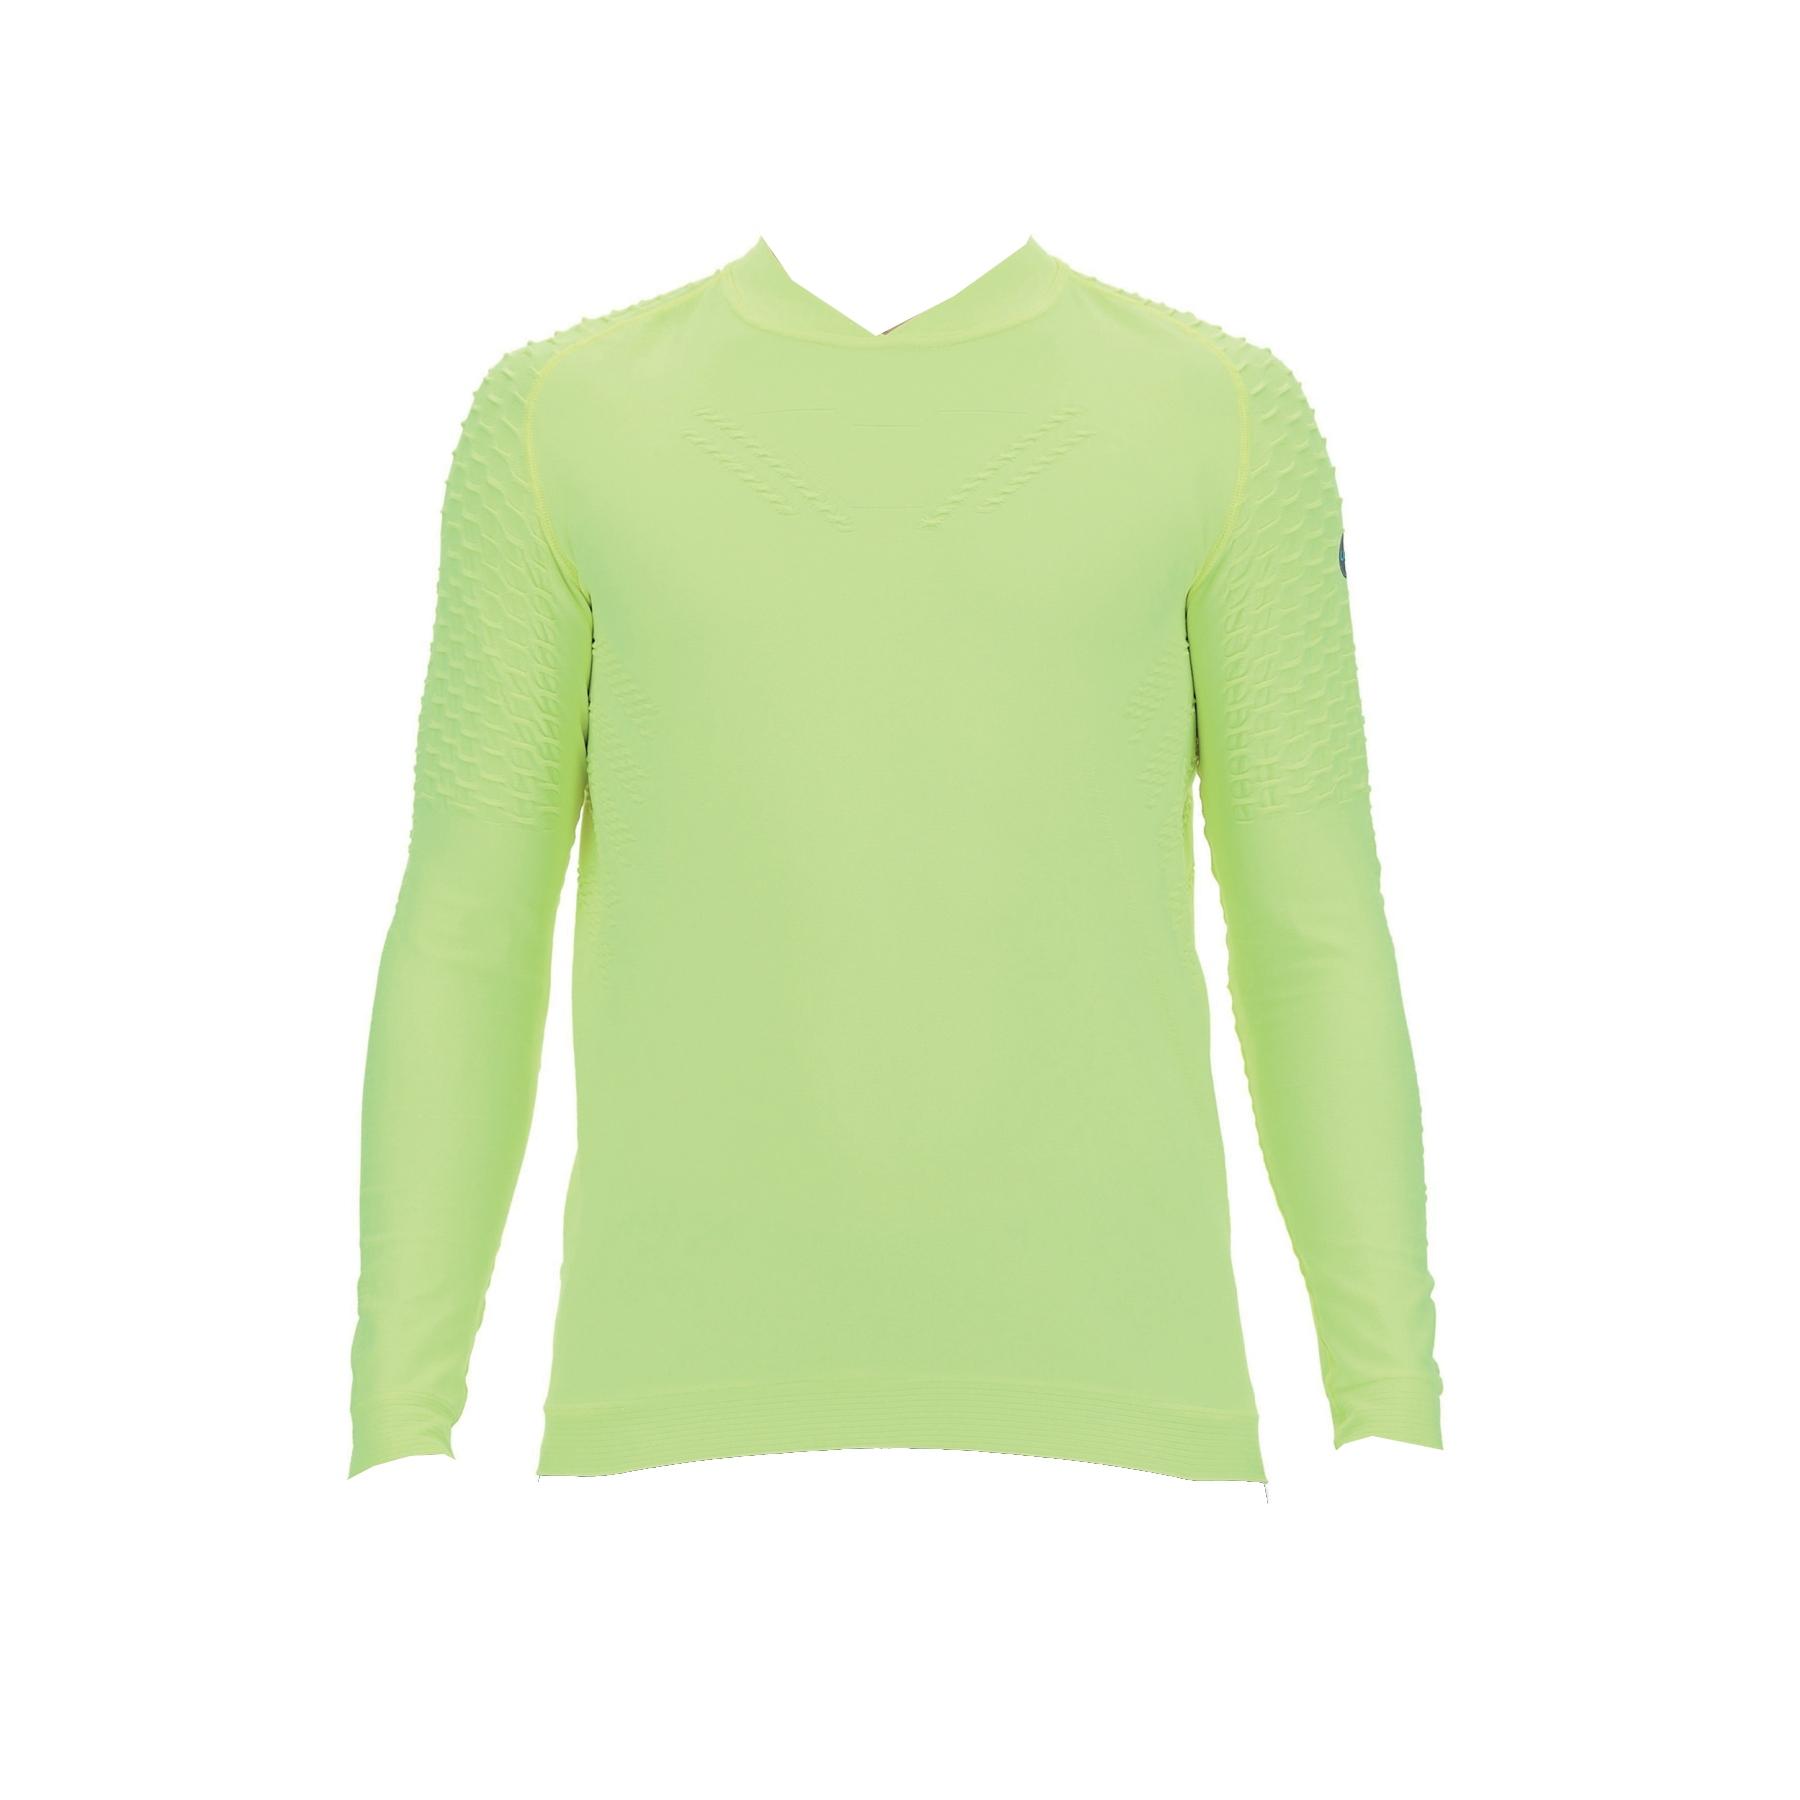 UYN City Running Longsleeve Shirt - Yellow Fluo